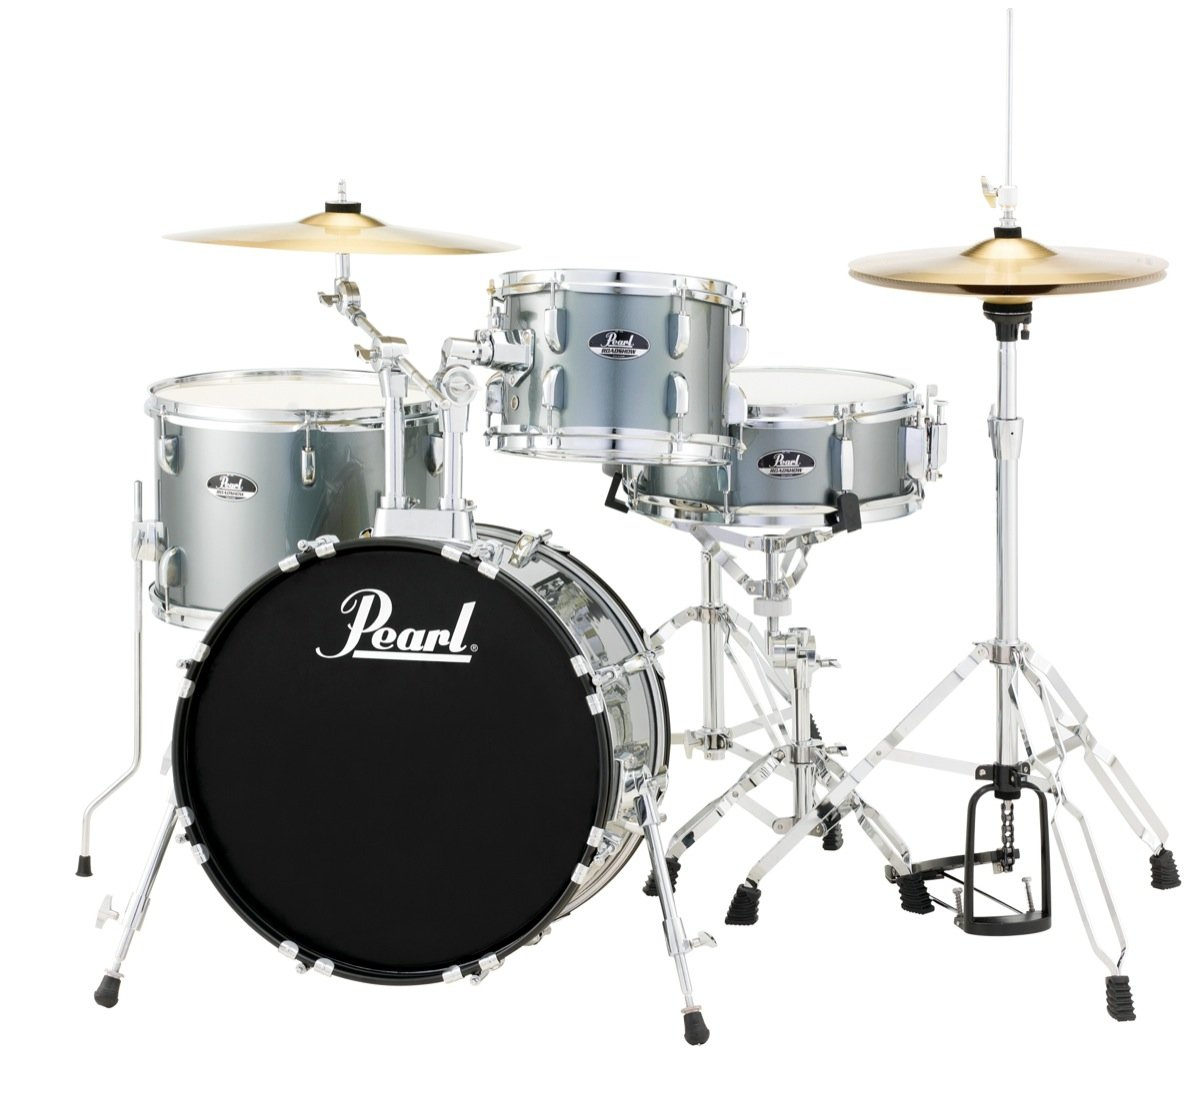 Jazz / Bop Drum Kit Roundup - CompactDrums